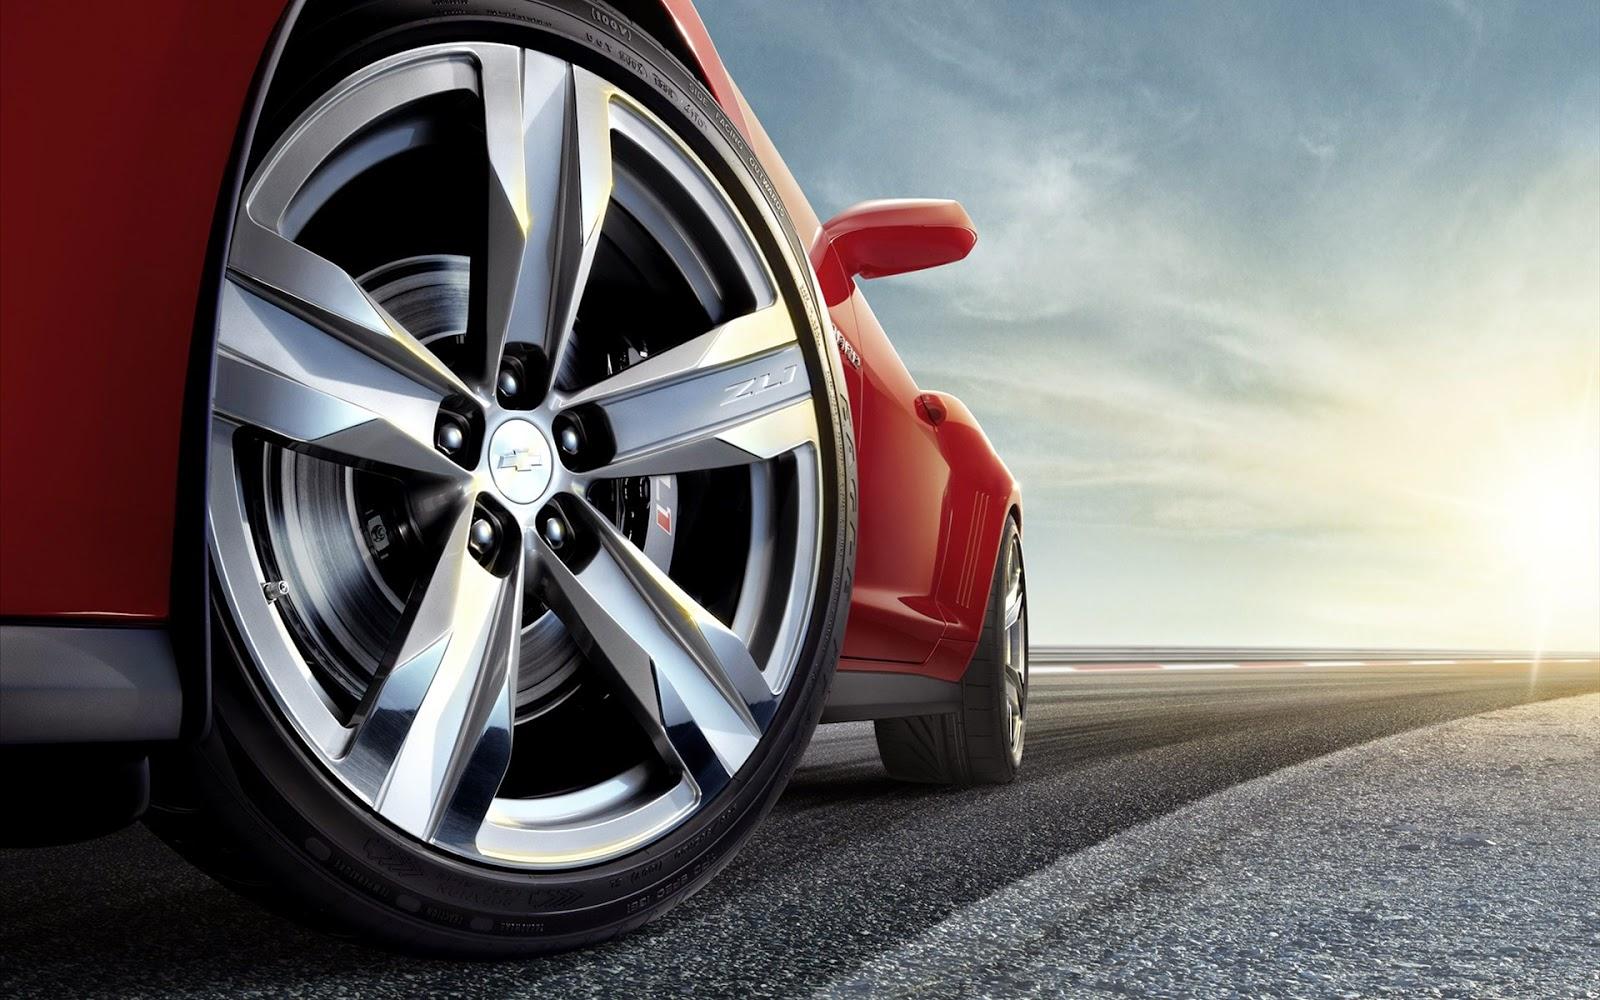 http://www.autocarsinfo.com/2014/10/chevrolet-camaro-zl1-2012-2-best.html